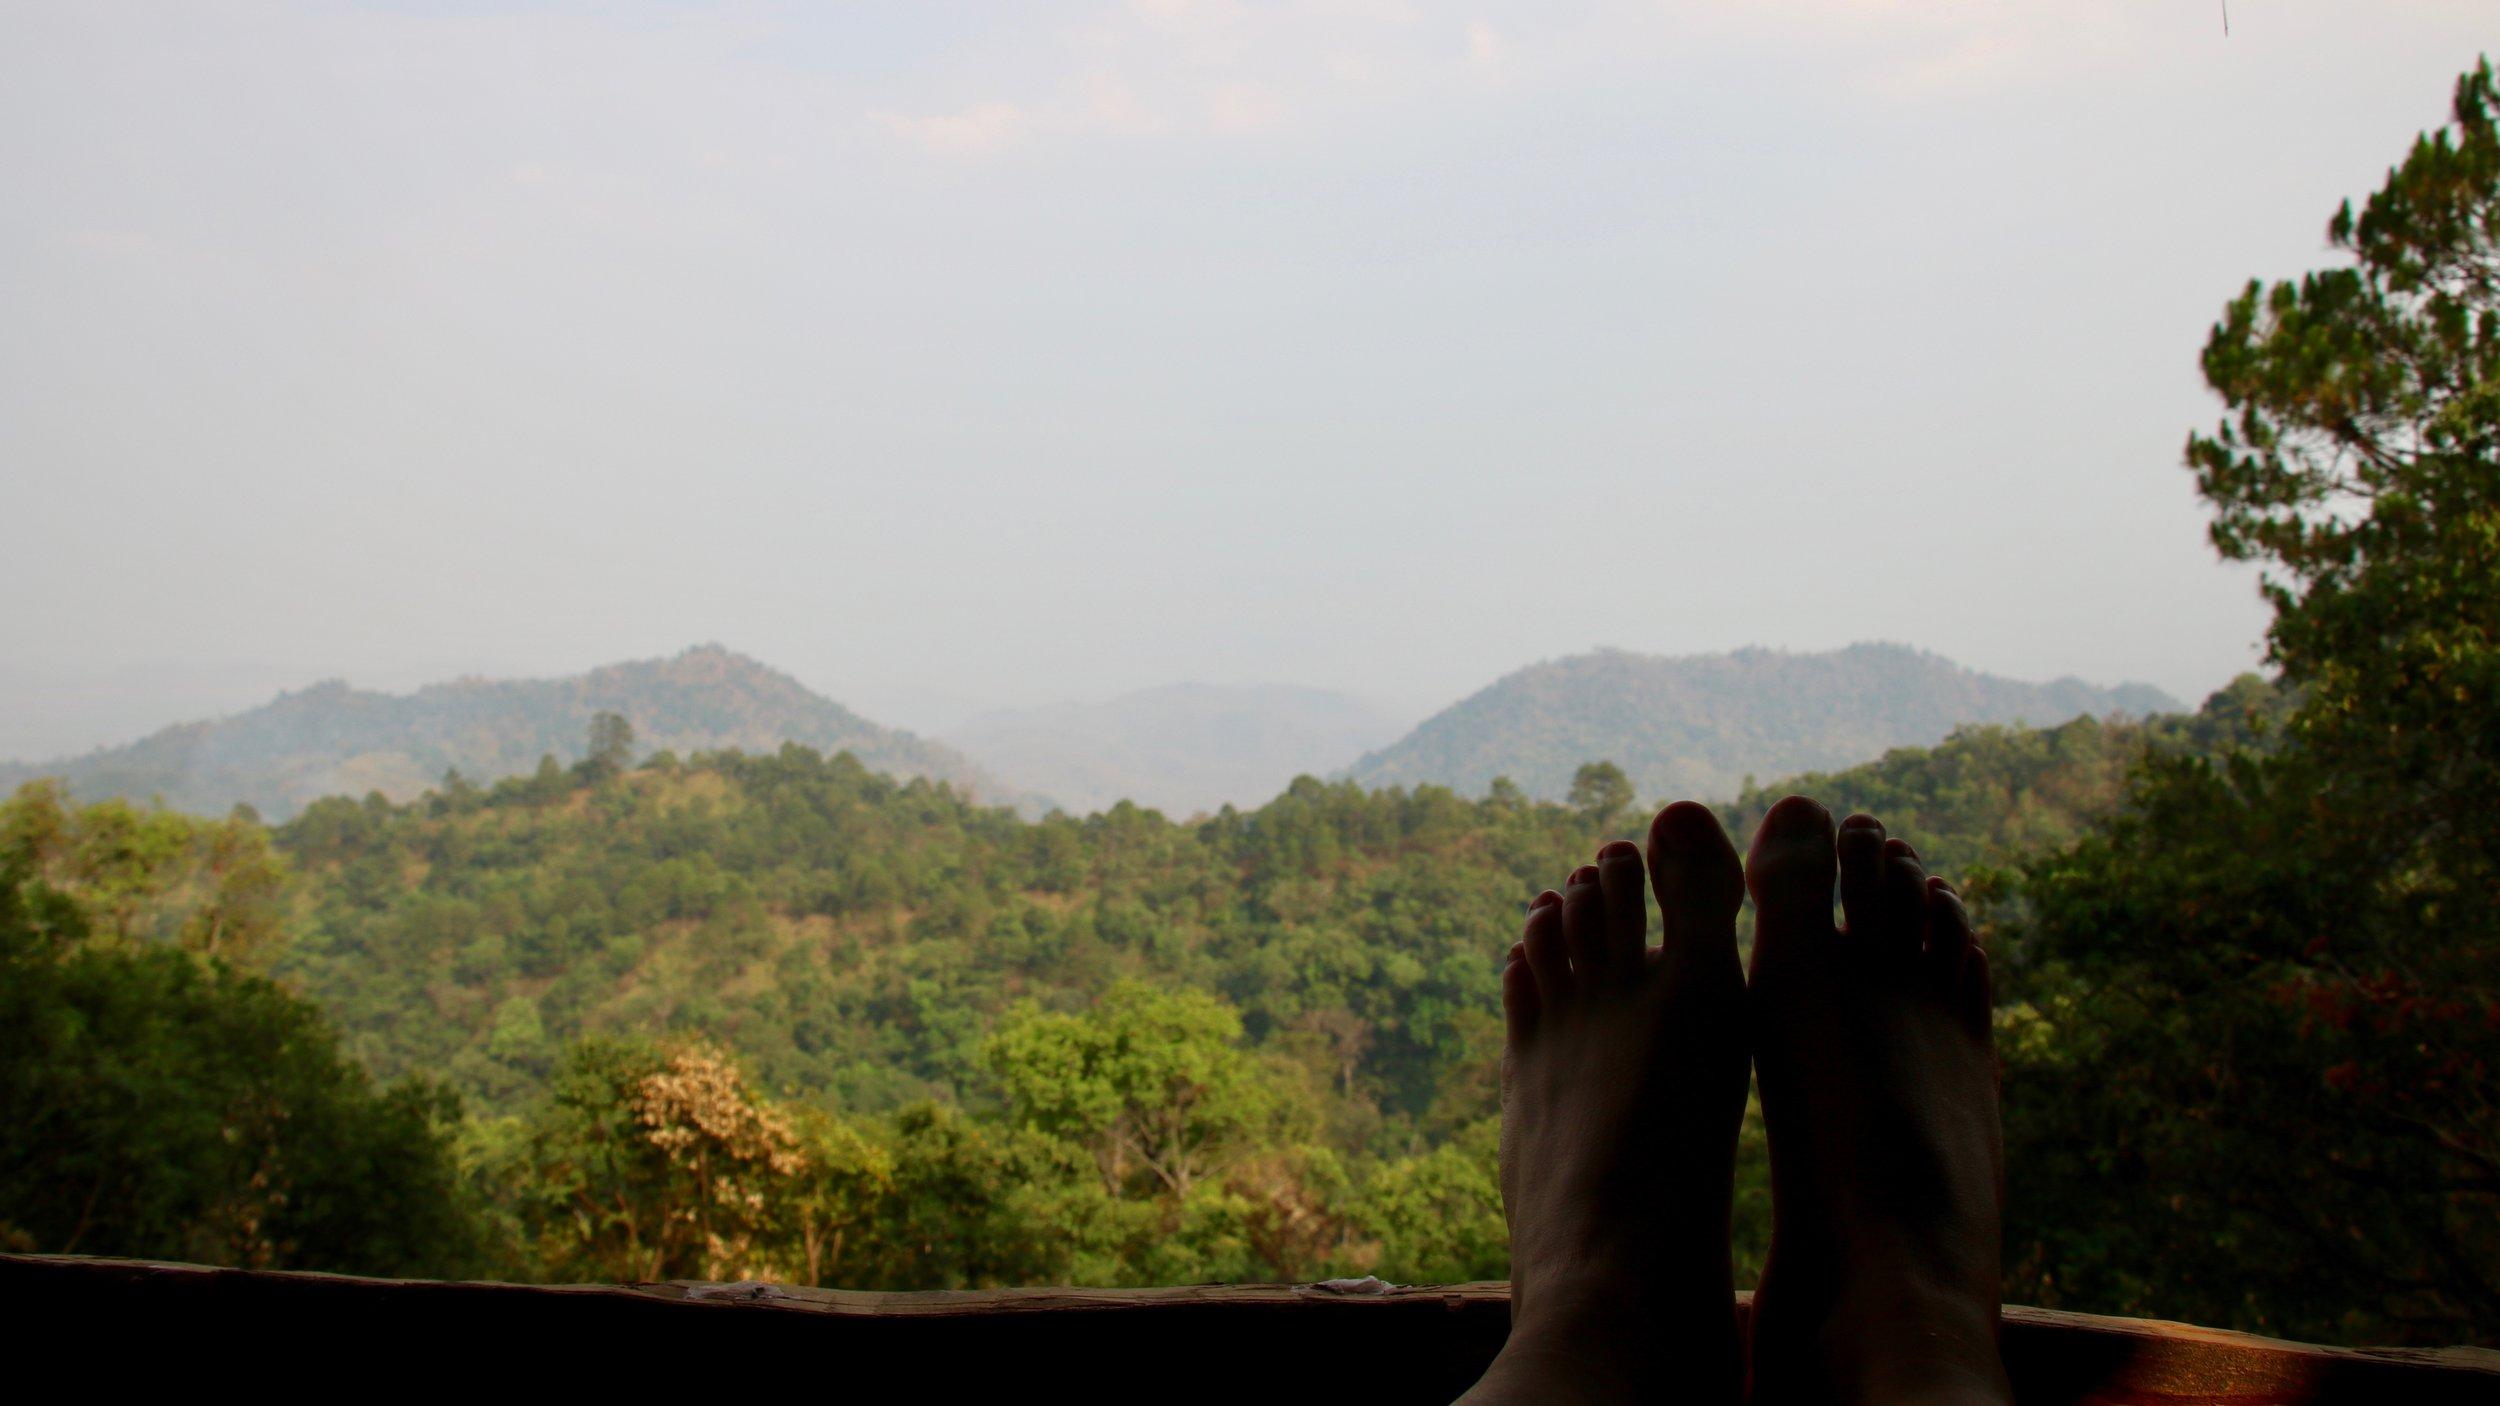 Resting feet after trekking at Mr Bike's treehouse near Hsipaw, Myanmar @acrosslandsea